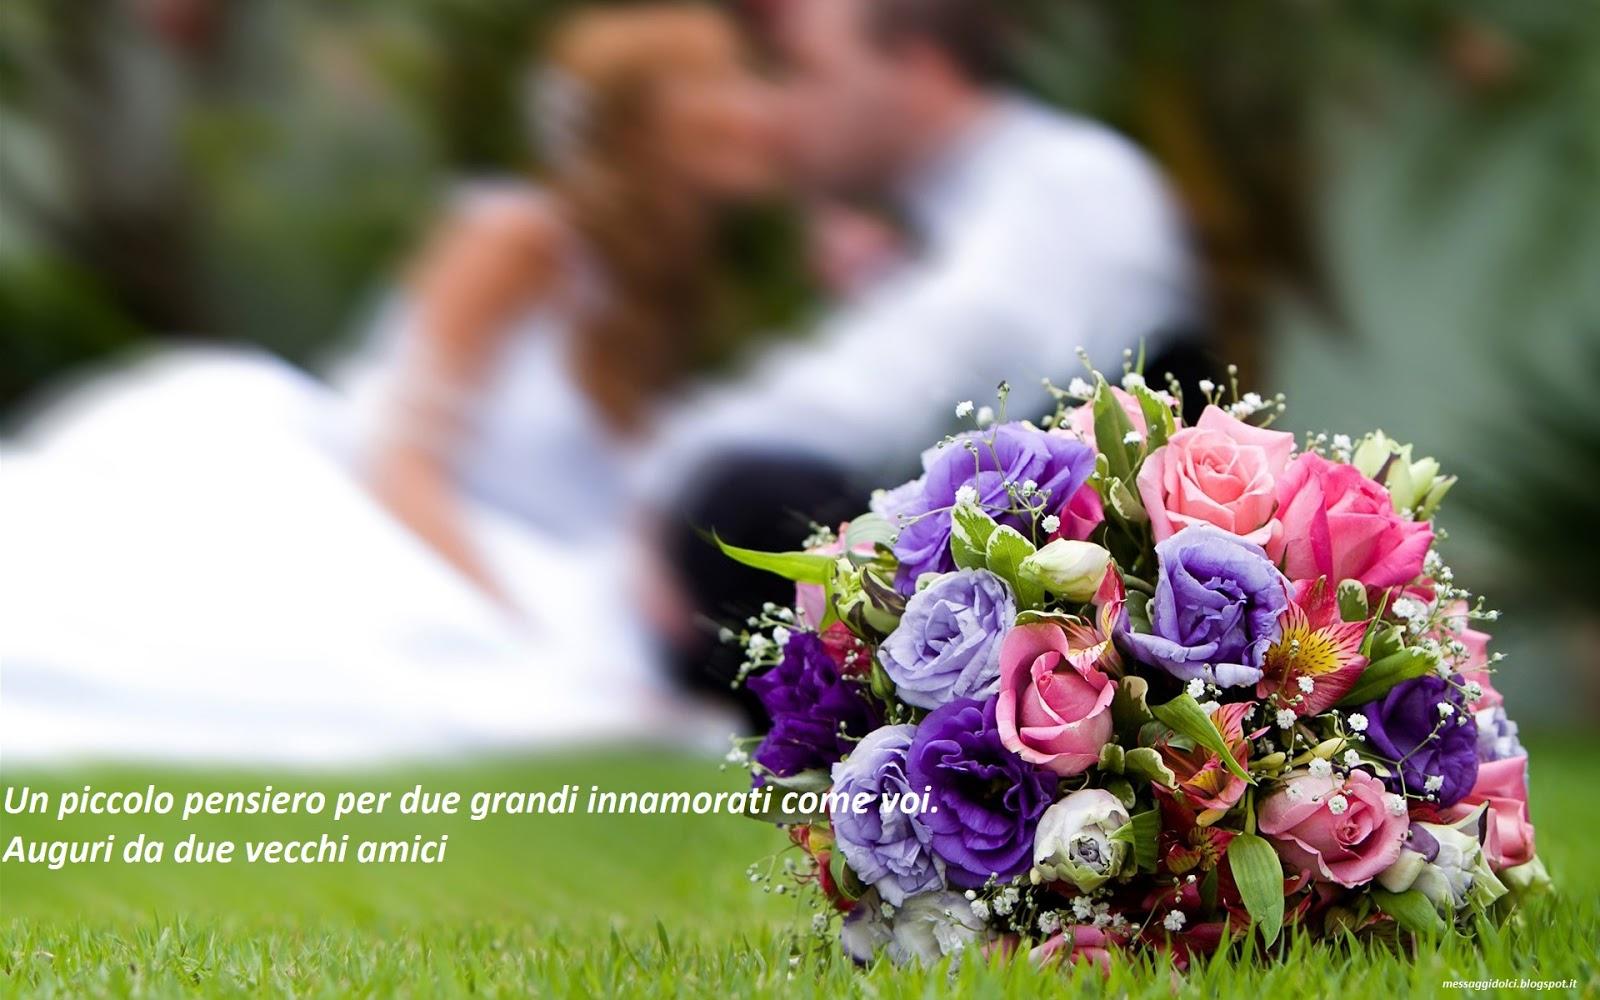 Auguri Matrimonio Telegramma : Frasi matrimonio celebri messaggi dolci